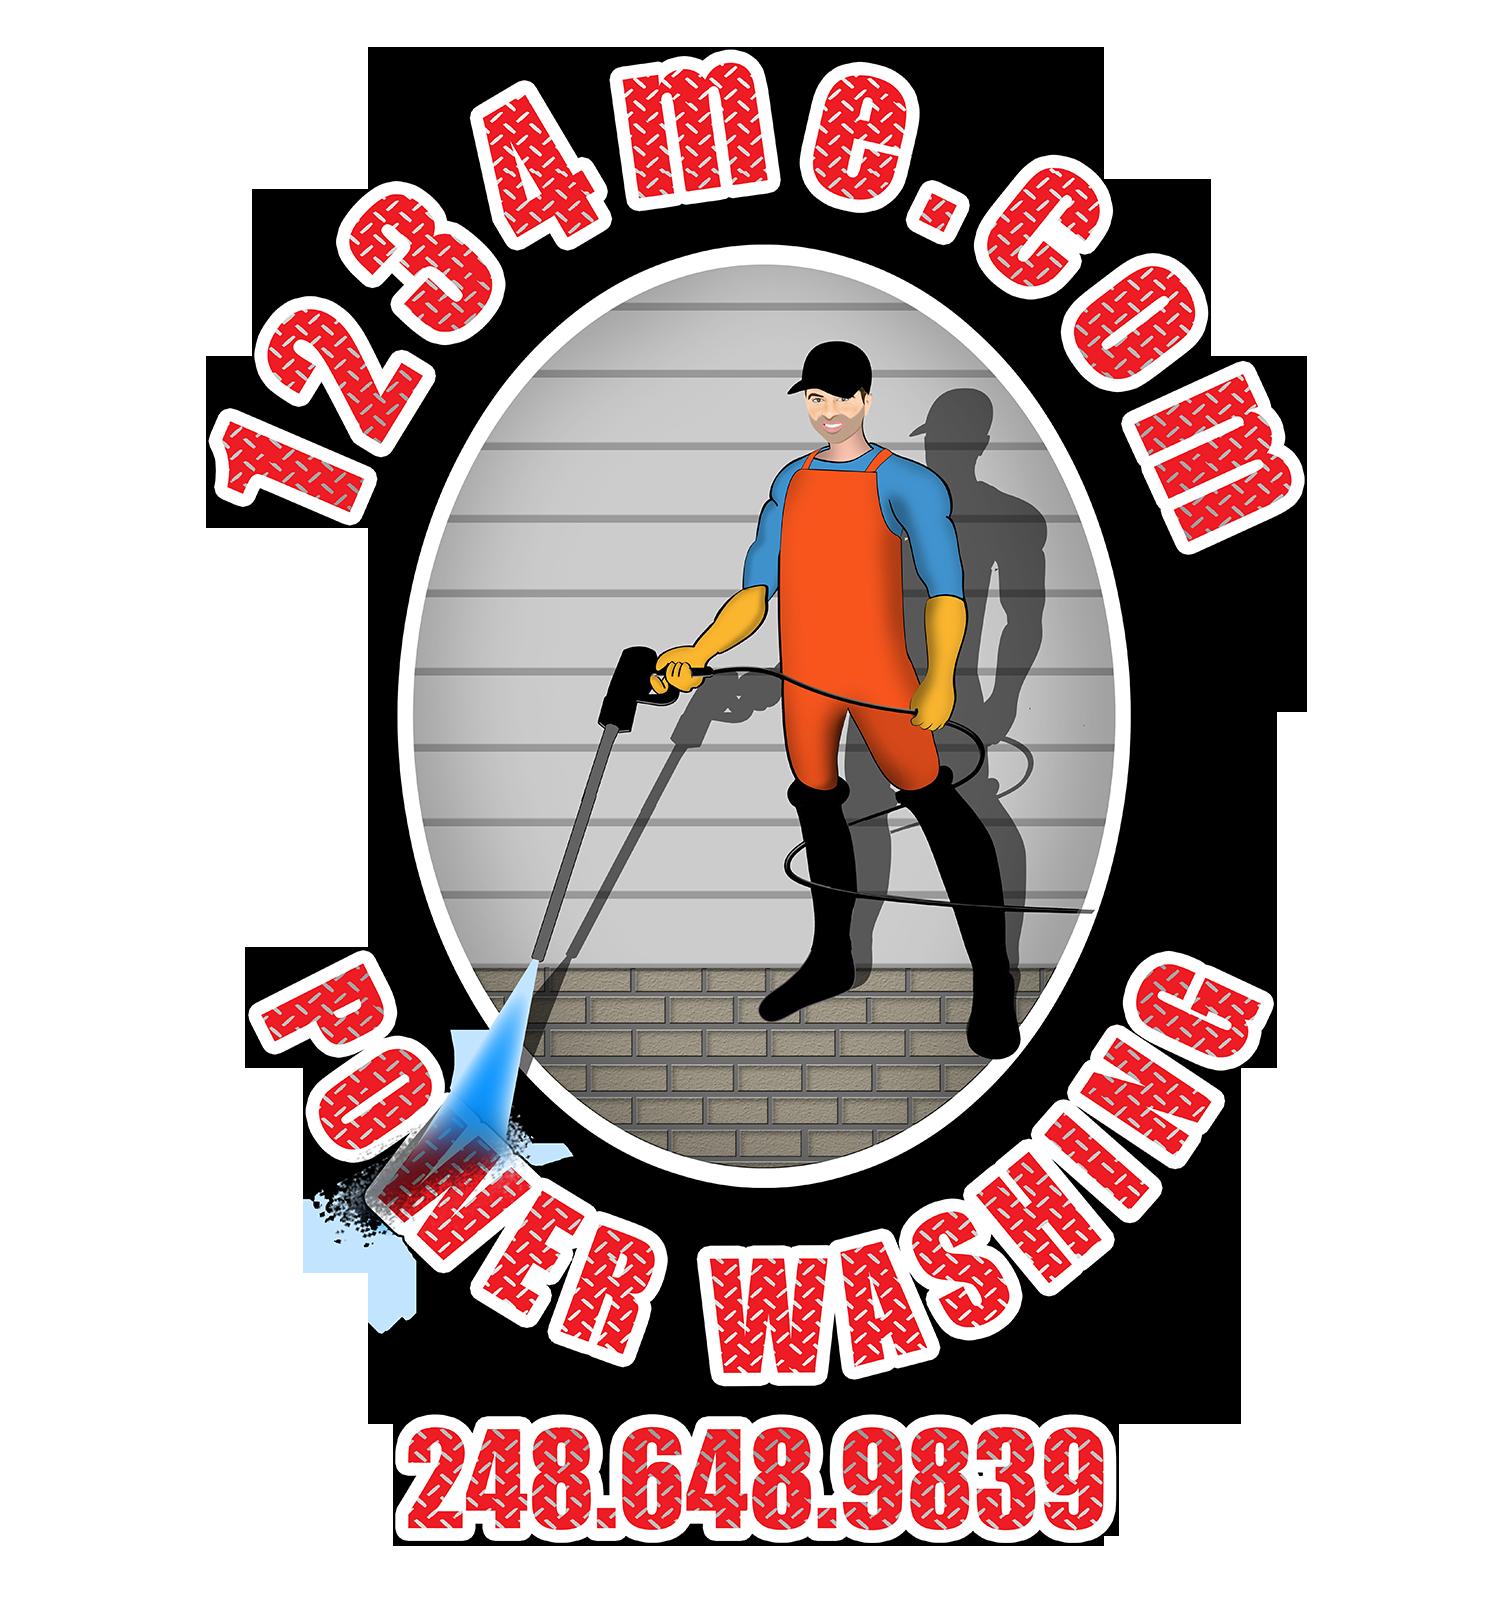 pwr-wash212.png - Expert Pressure/Power Washing Serving Oakland ...